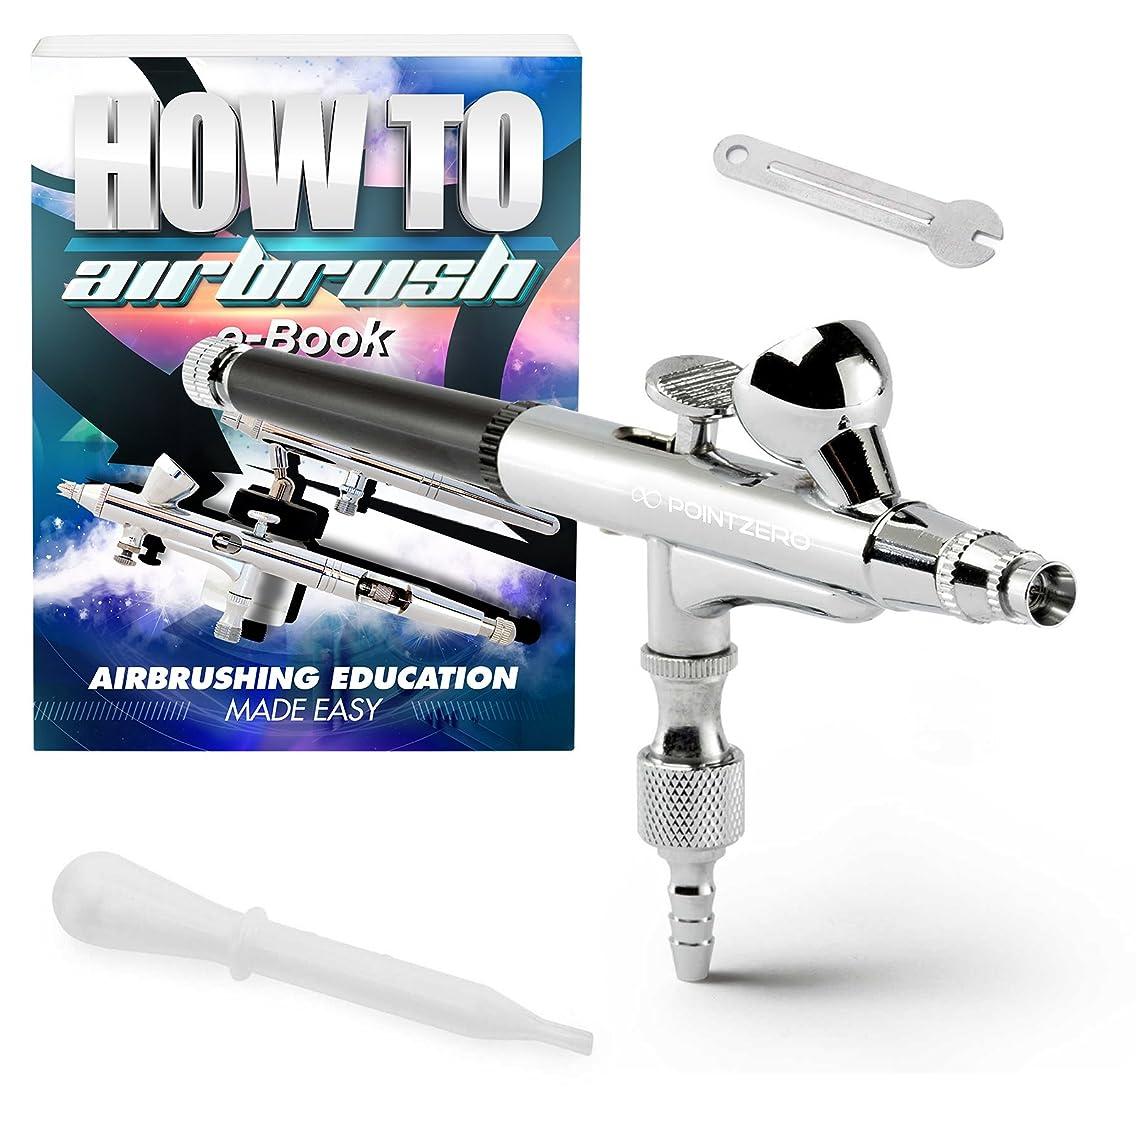 PointZero Dual-Action 2cc Gravity-Feed Airbrush Set - .2mm Nozzle